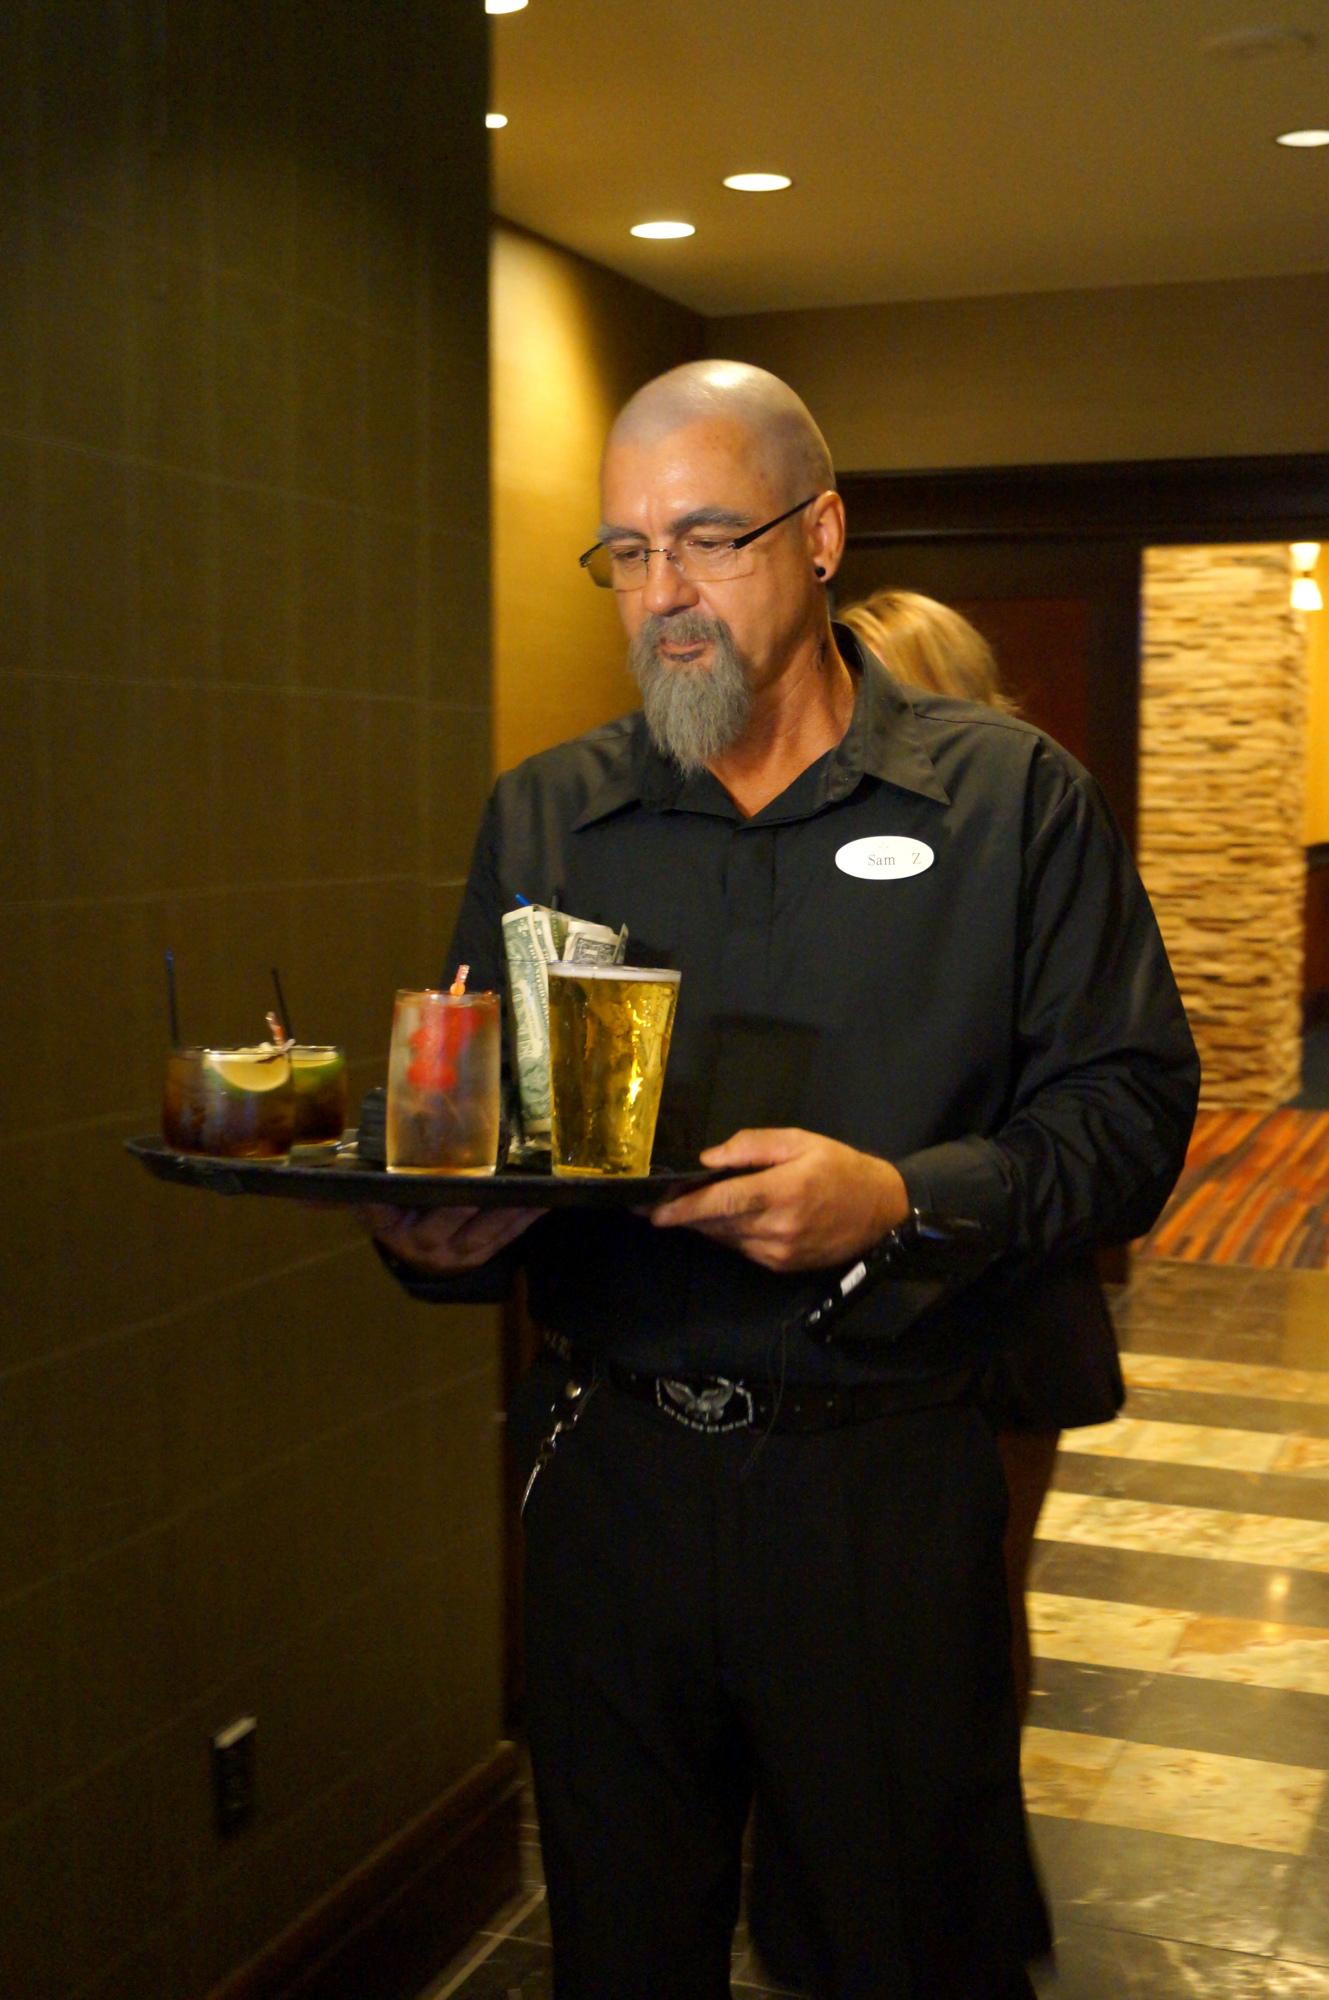 Serving drinks in Season 5 Episode 11